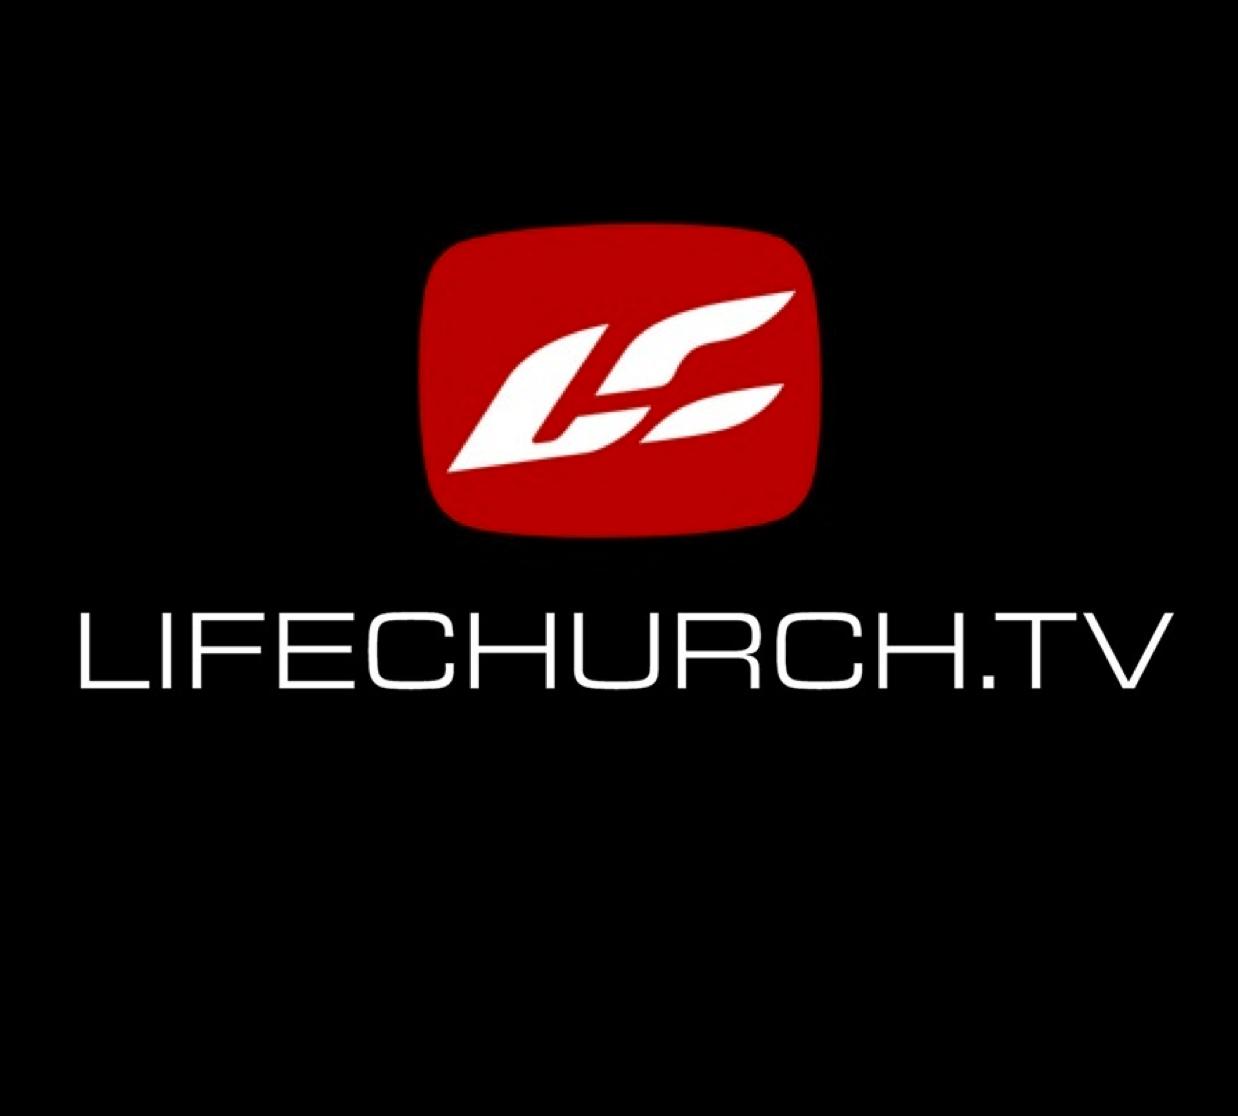 best-christian-churches-life-church-Craig-Groeschel-logo